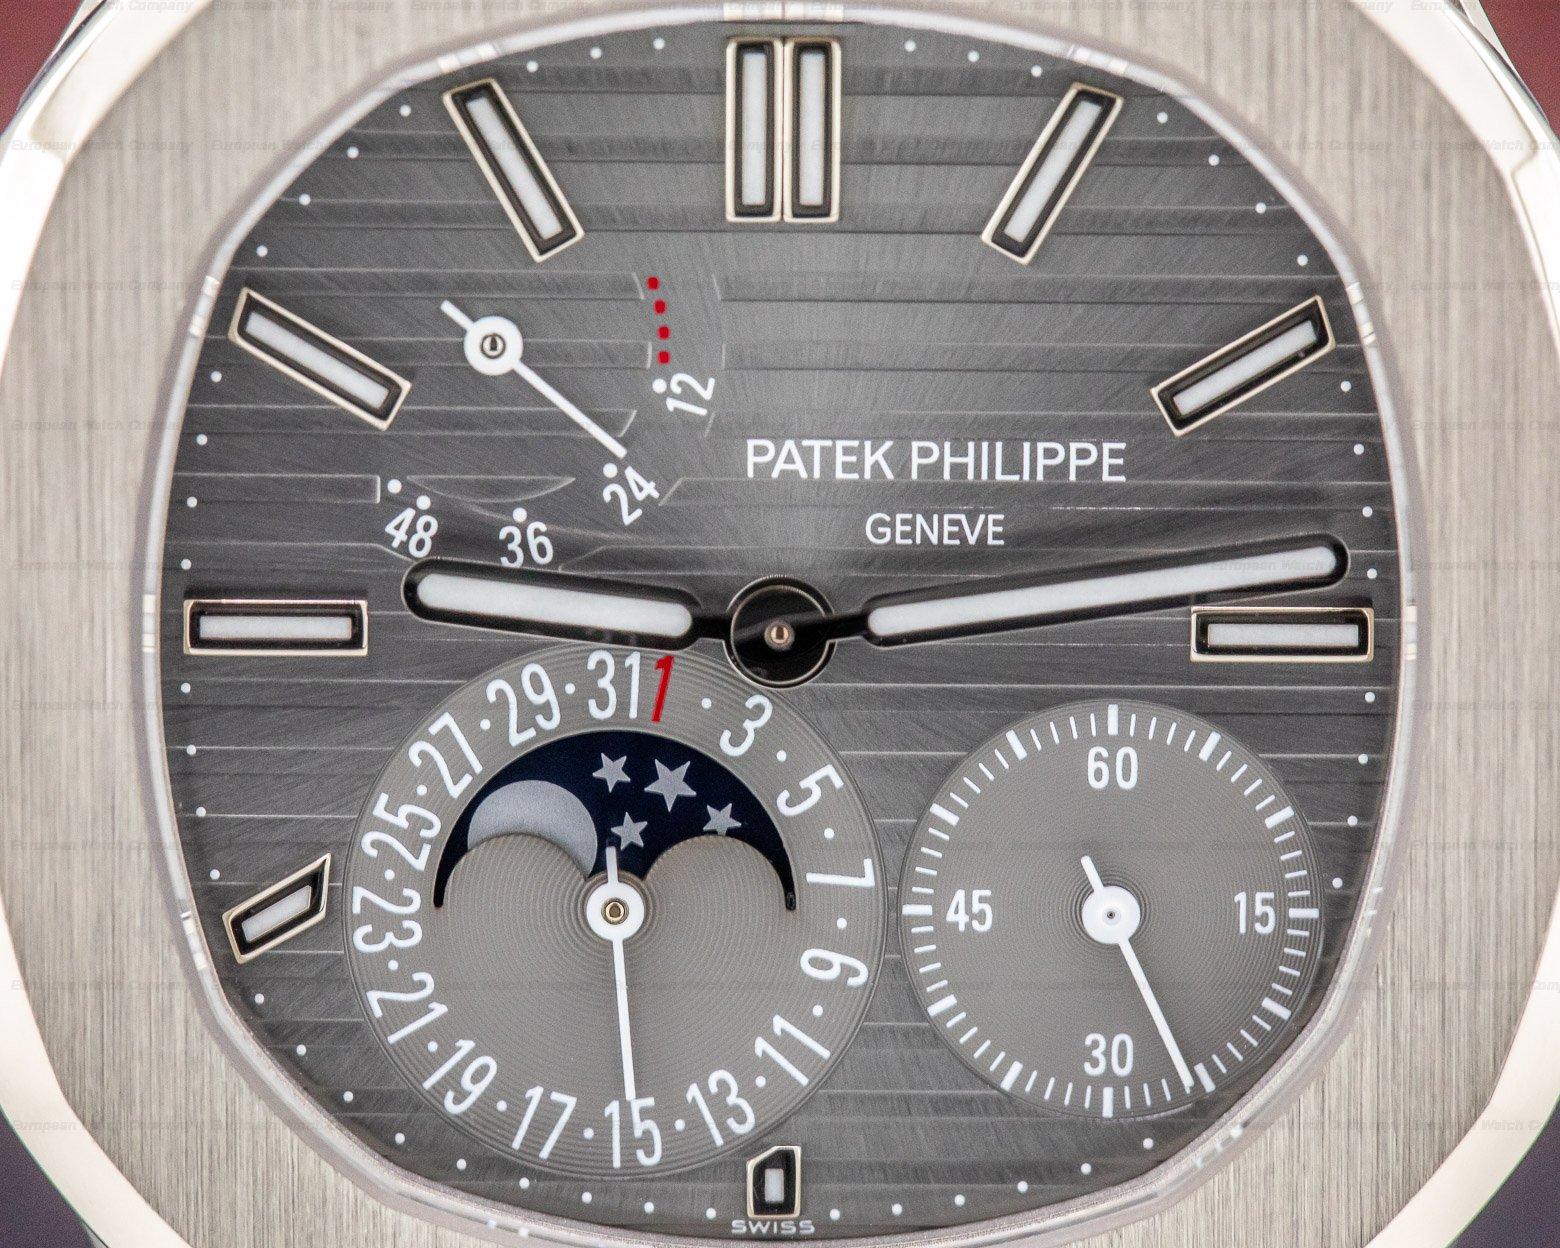 Patek Philippe 5712G-001 Nautilus Power Reserve Moonphase 18K White Gold